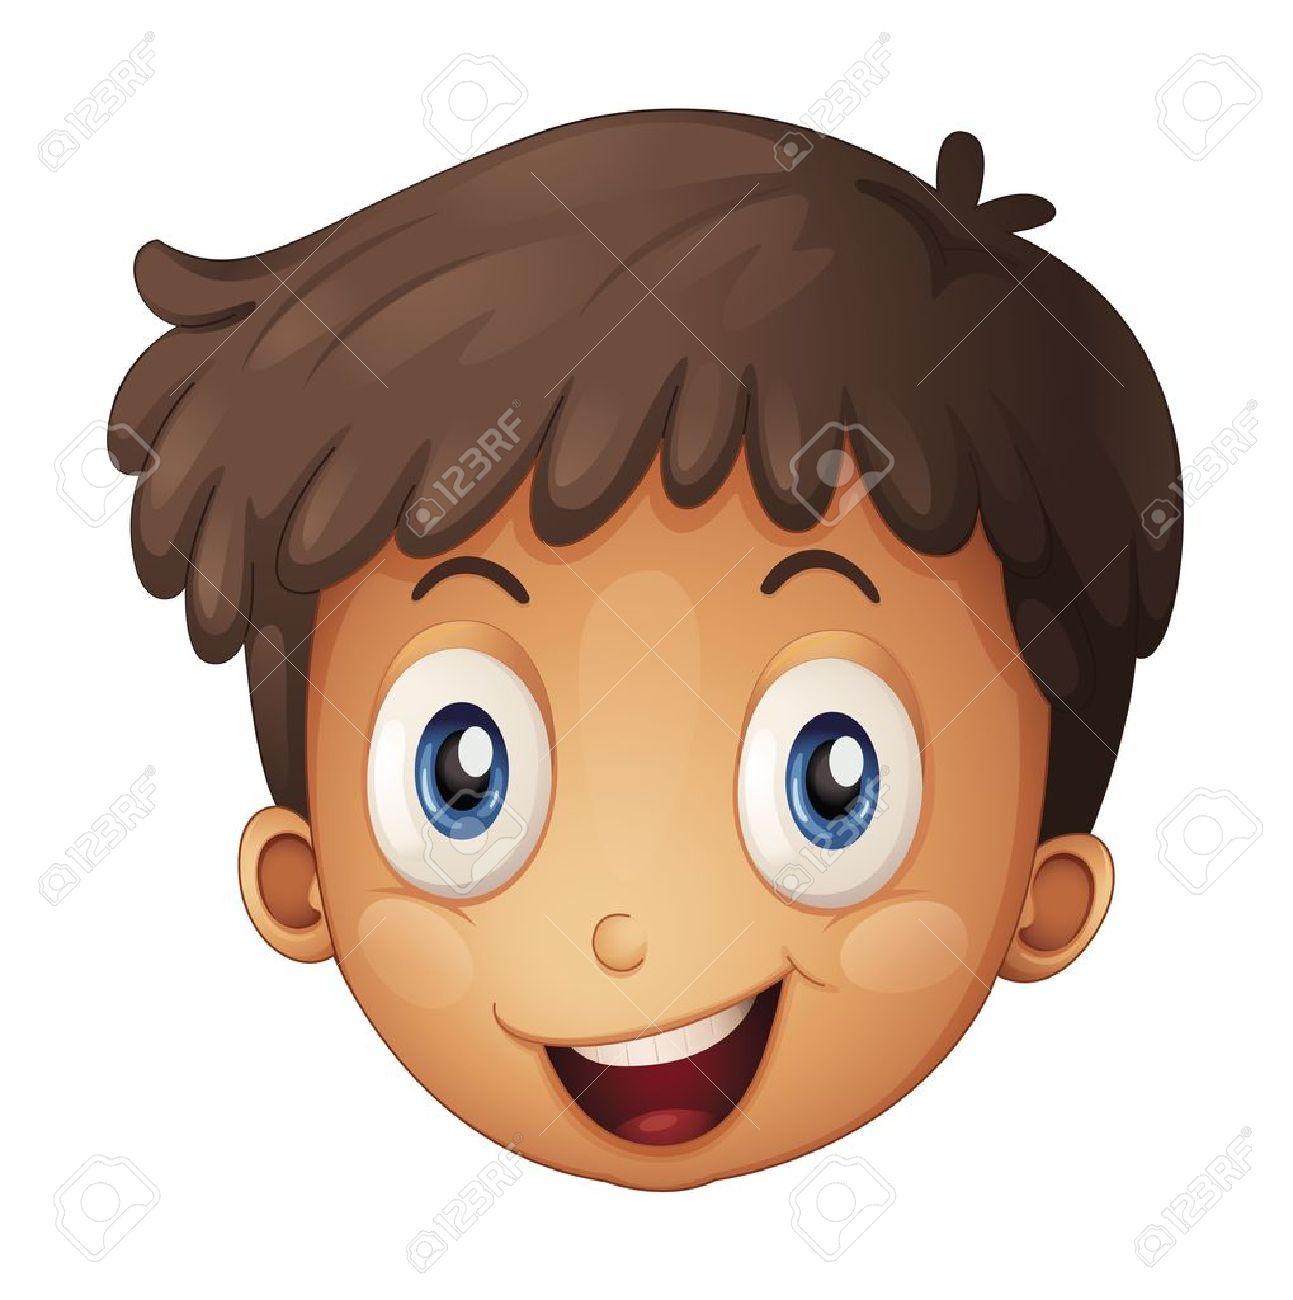 Eyeball clipart boy Royalty Illustration On A brown